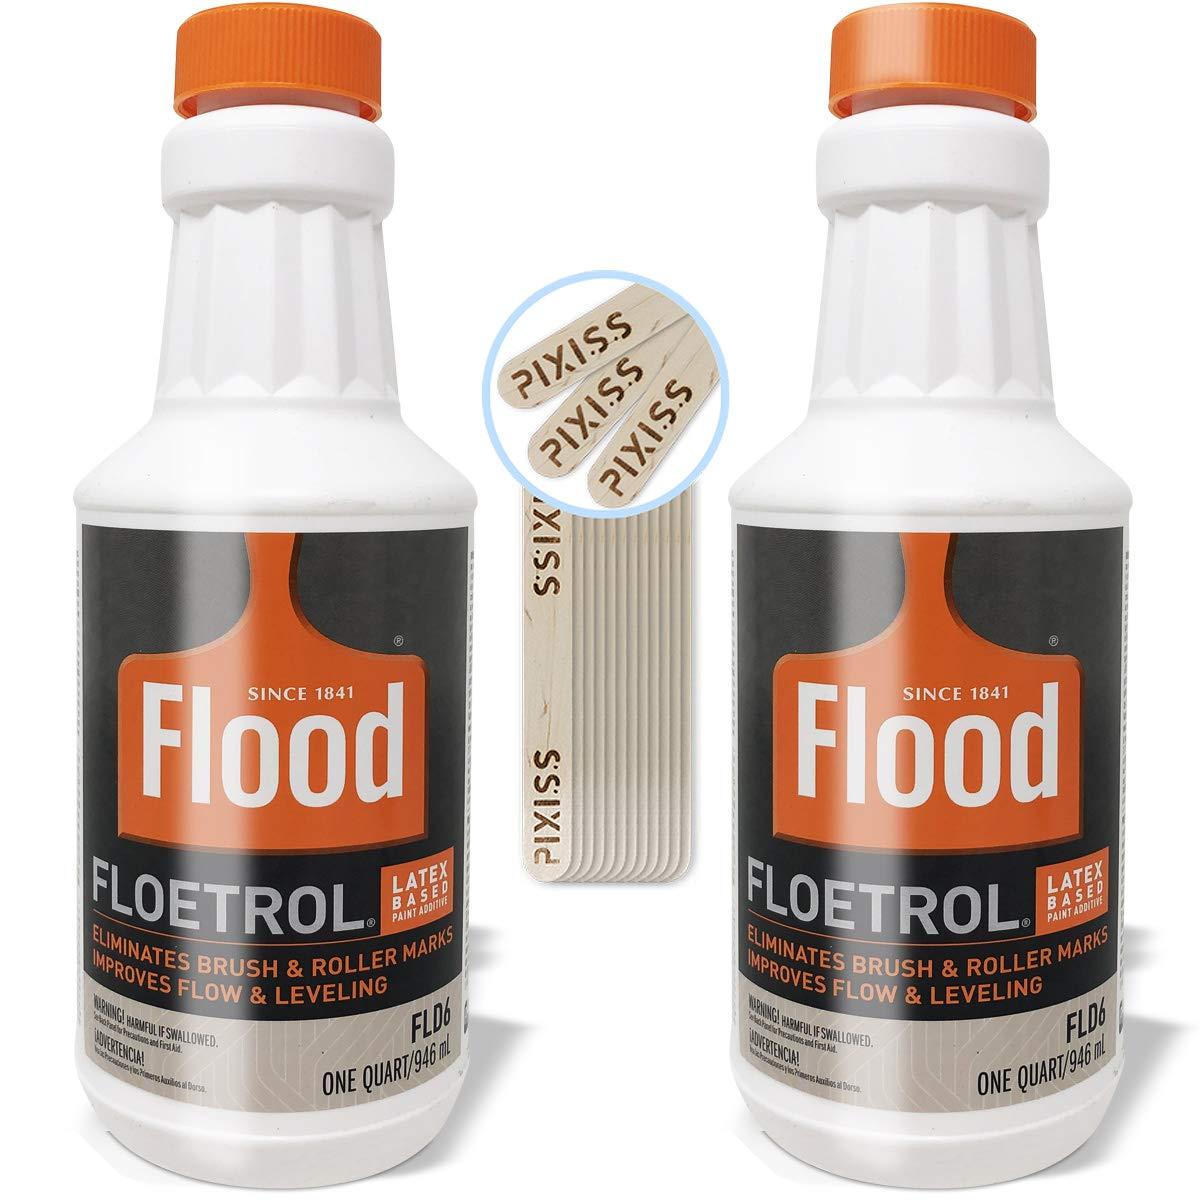 Floetrol Pouring Medium for Acrylic Paint   1 Quart Bottles (2-Pack)   Flood Flotrol Additive   20 Pixiss Wood Mixing Sticks Pouring Bundle